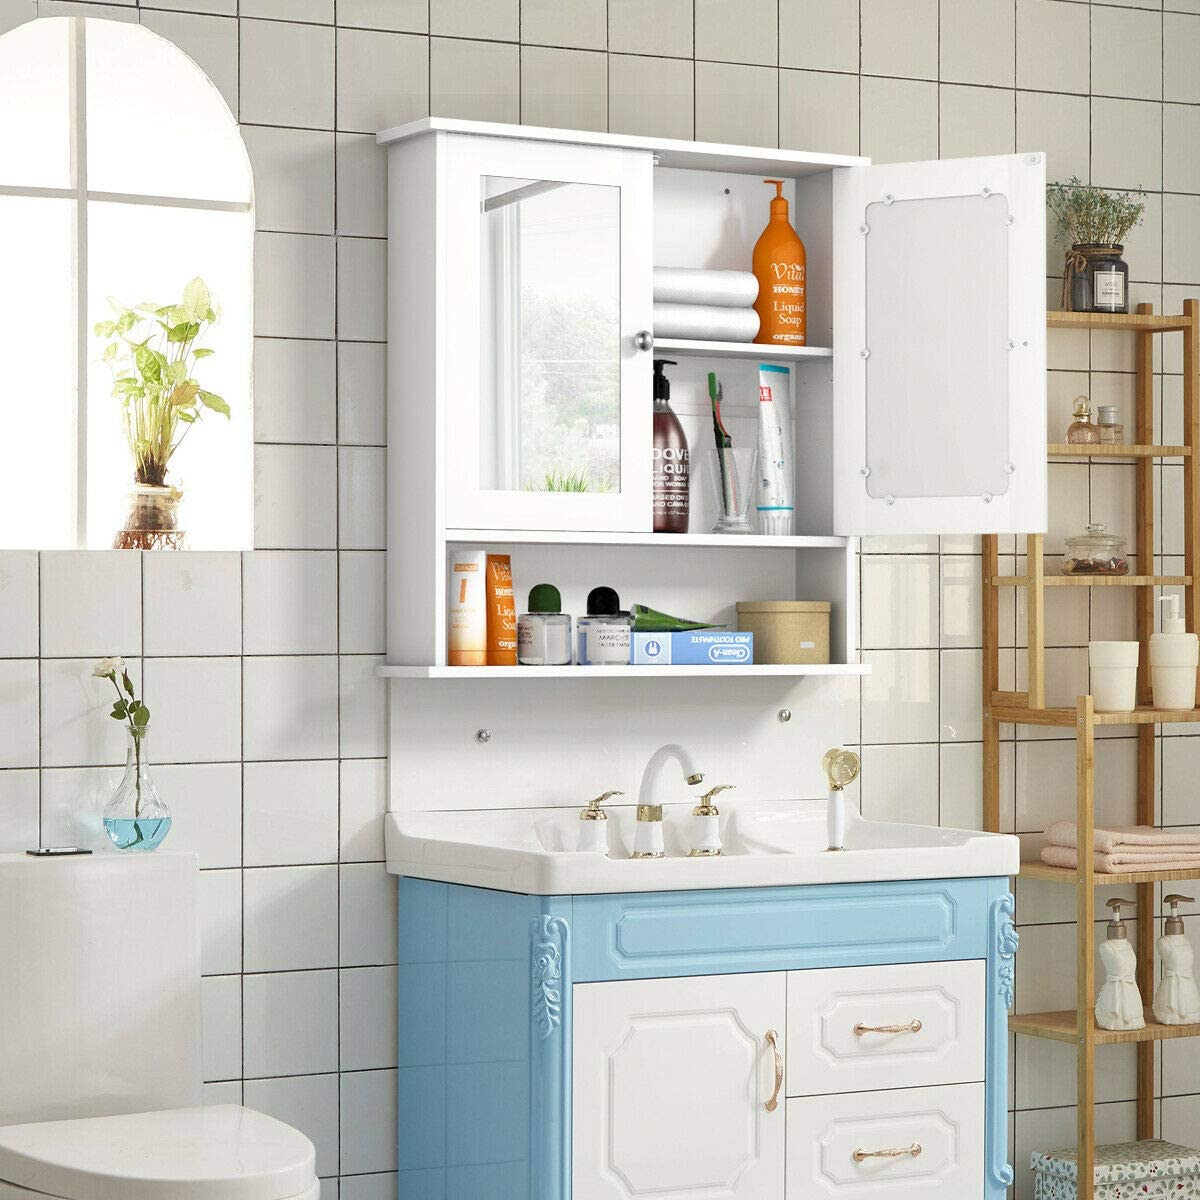 Amazon Com Kovalenthor Double Doors Shelves Bathroom Wall Storage Cabinet Wooden Storage Cabinets Organizer White Kitchen Dining